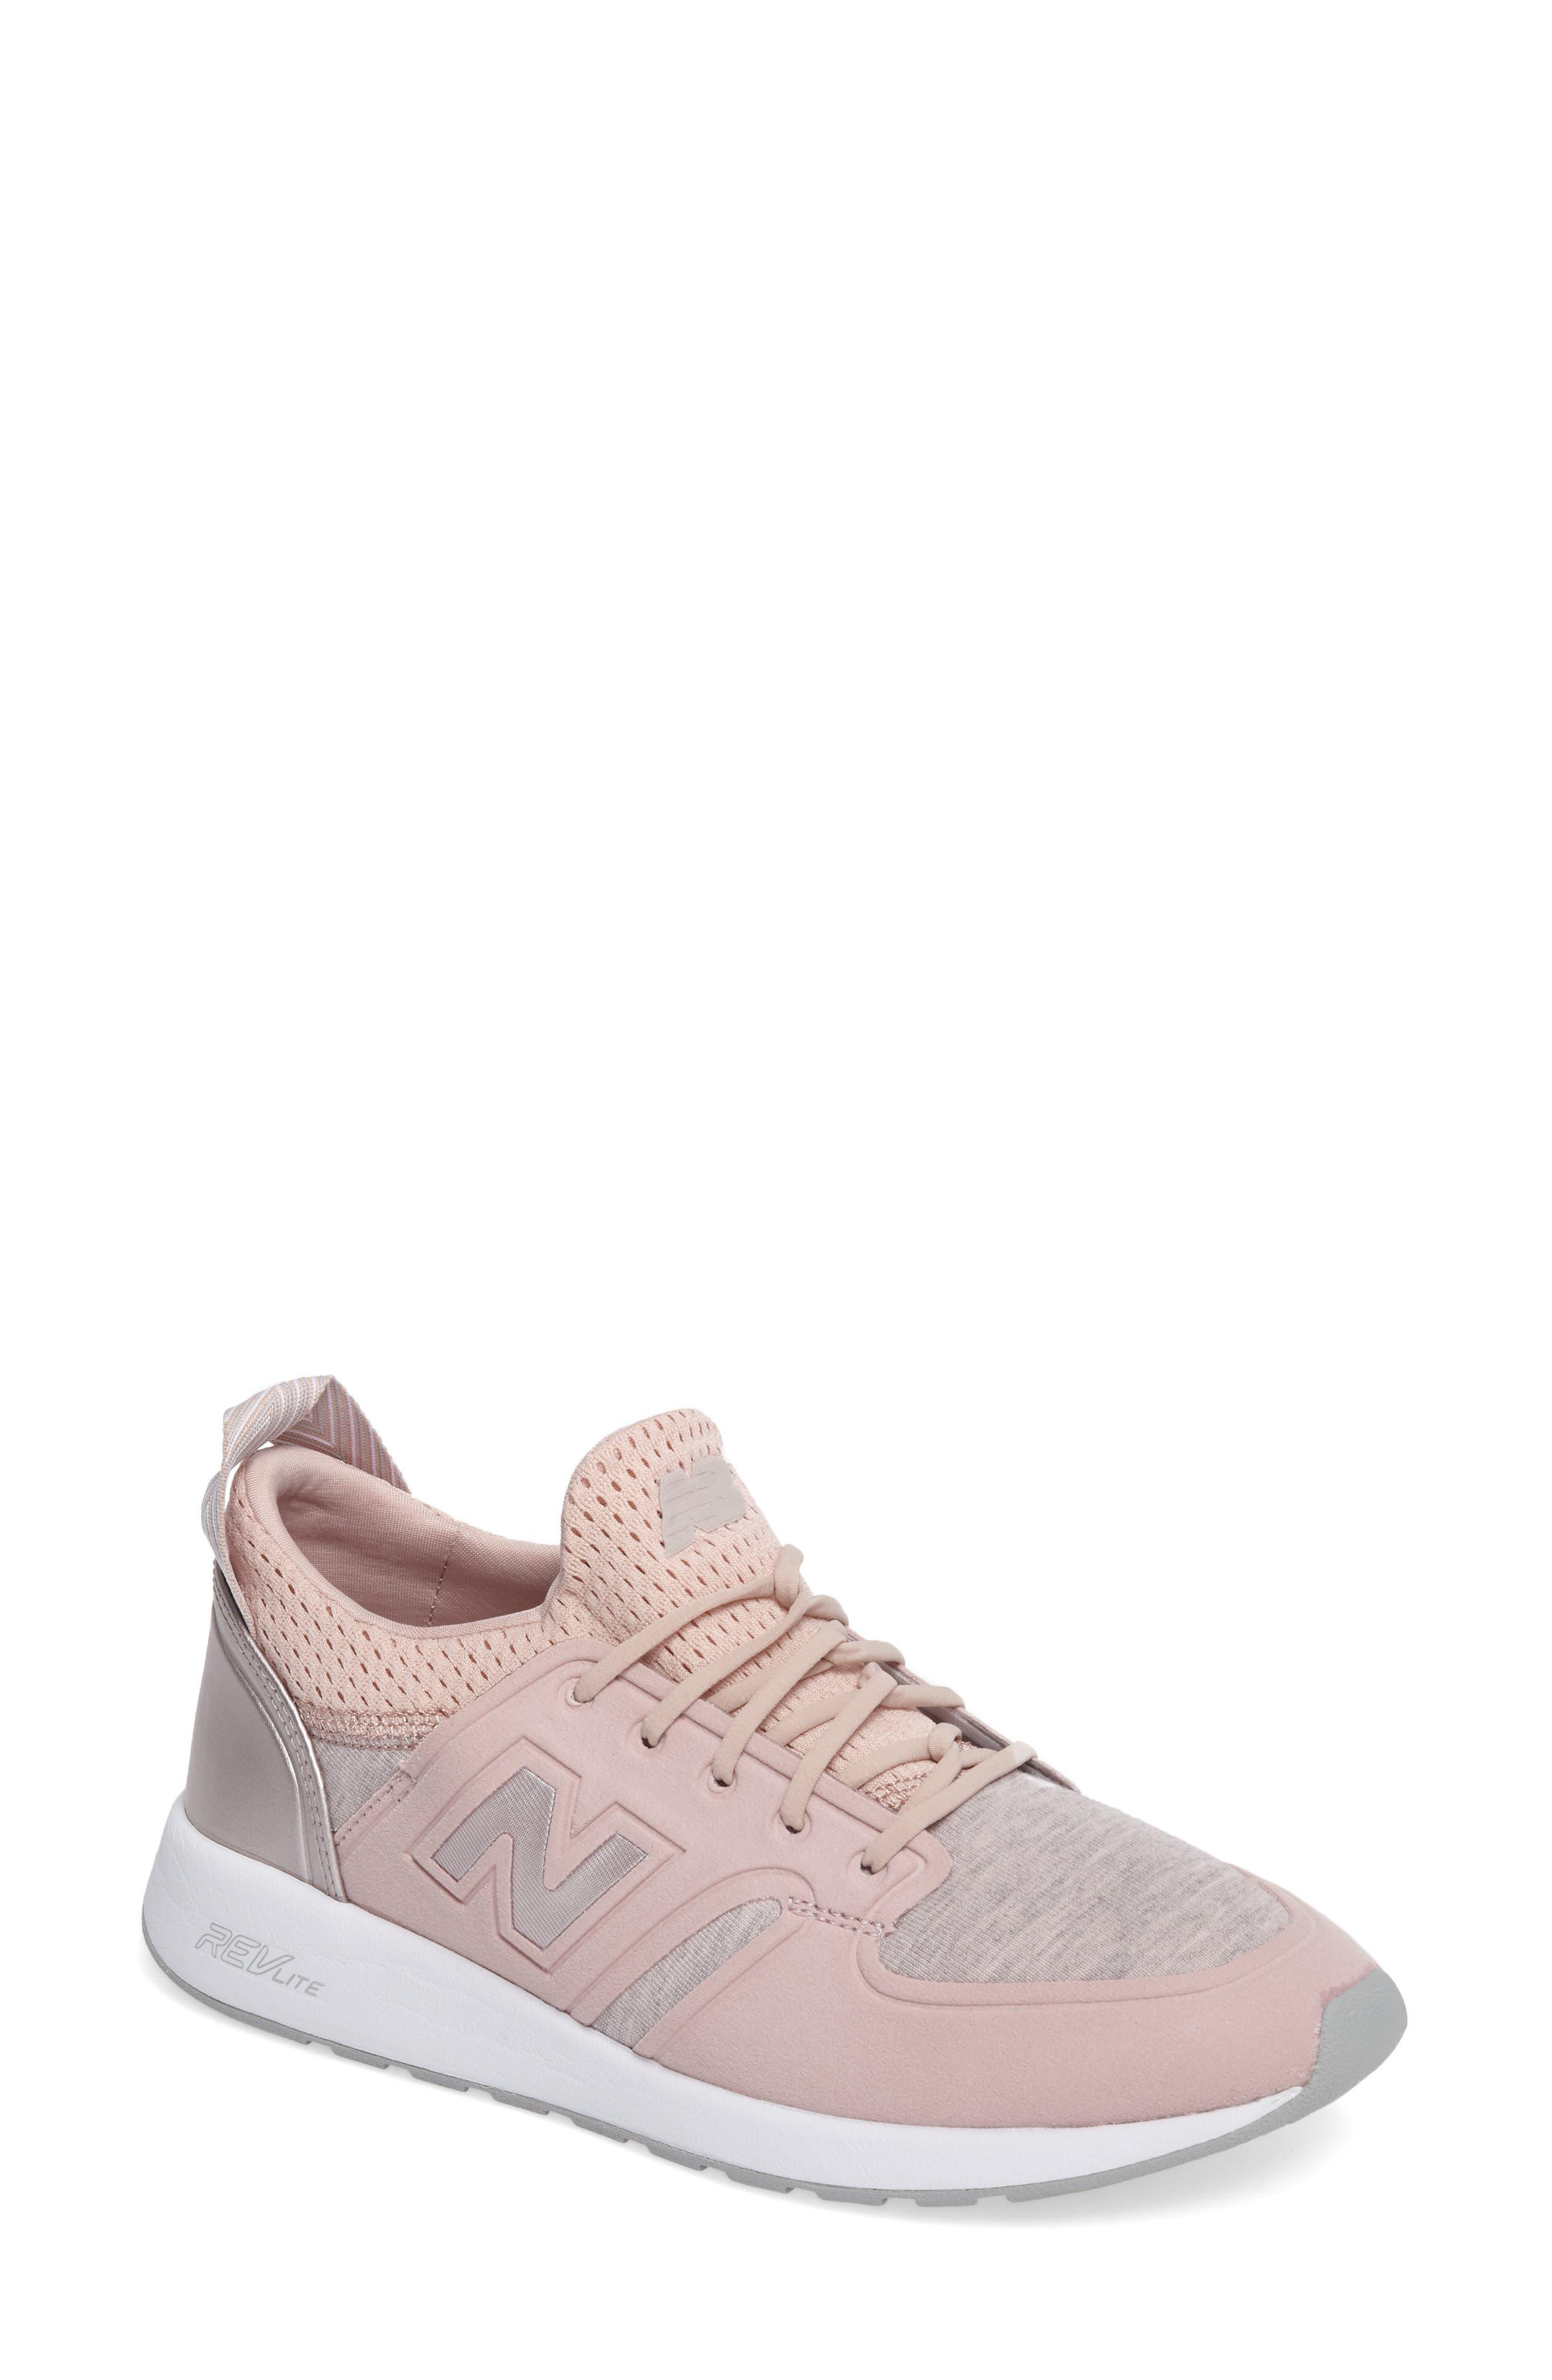 Main Image - New Balance \u0027420\u0027 Sneaker (Women)